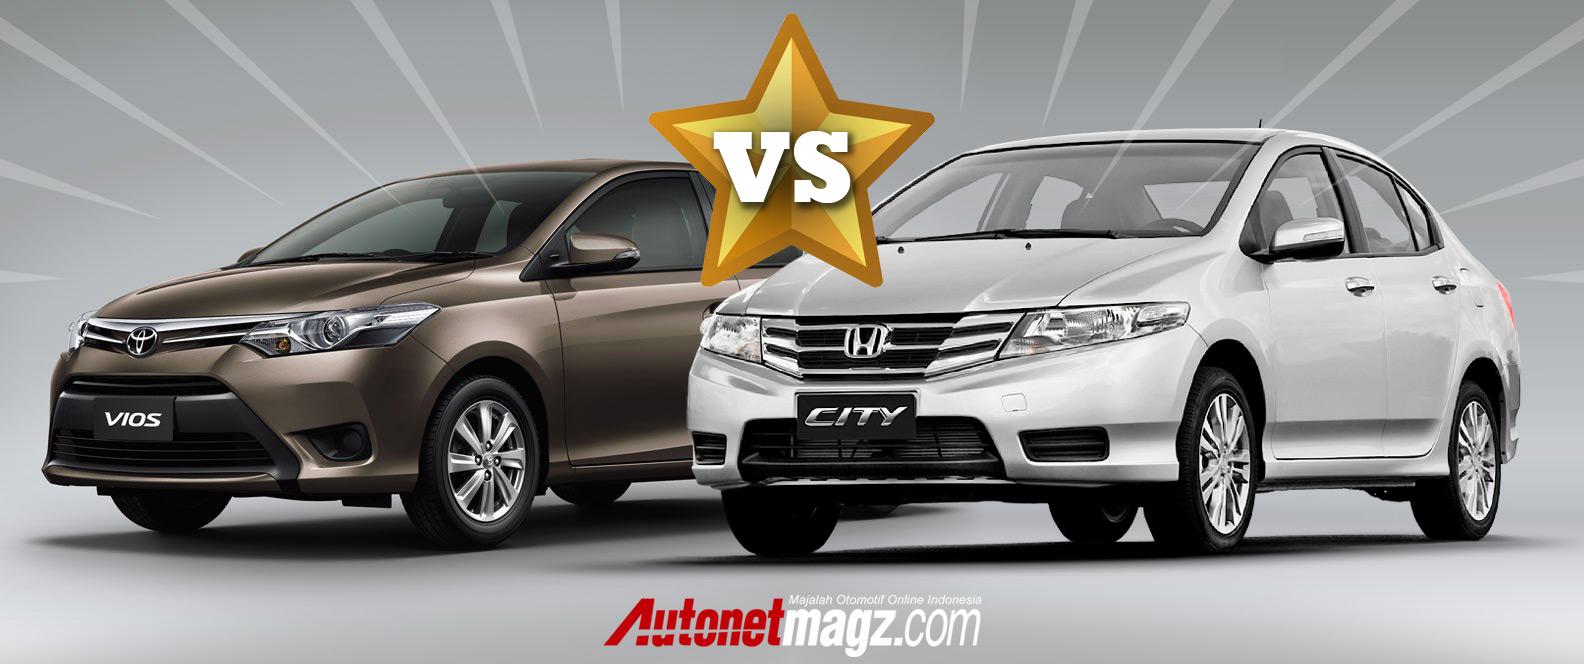 Honda, Komparasi Toyota New Vios vs Honda City 2013 oleh AutonetMagz.com: Komparasi Toyota Vios vs Honda City 2013